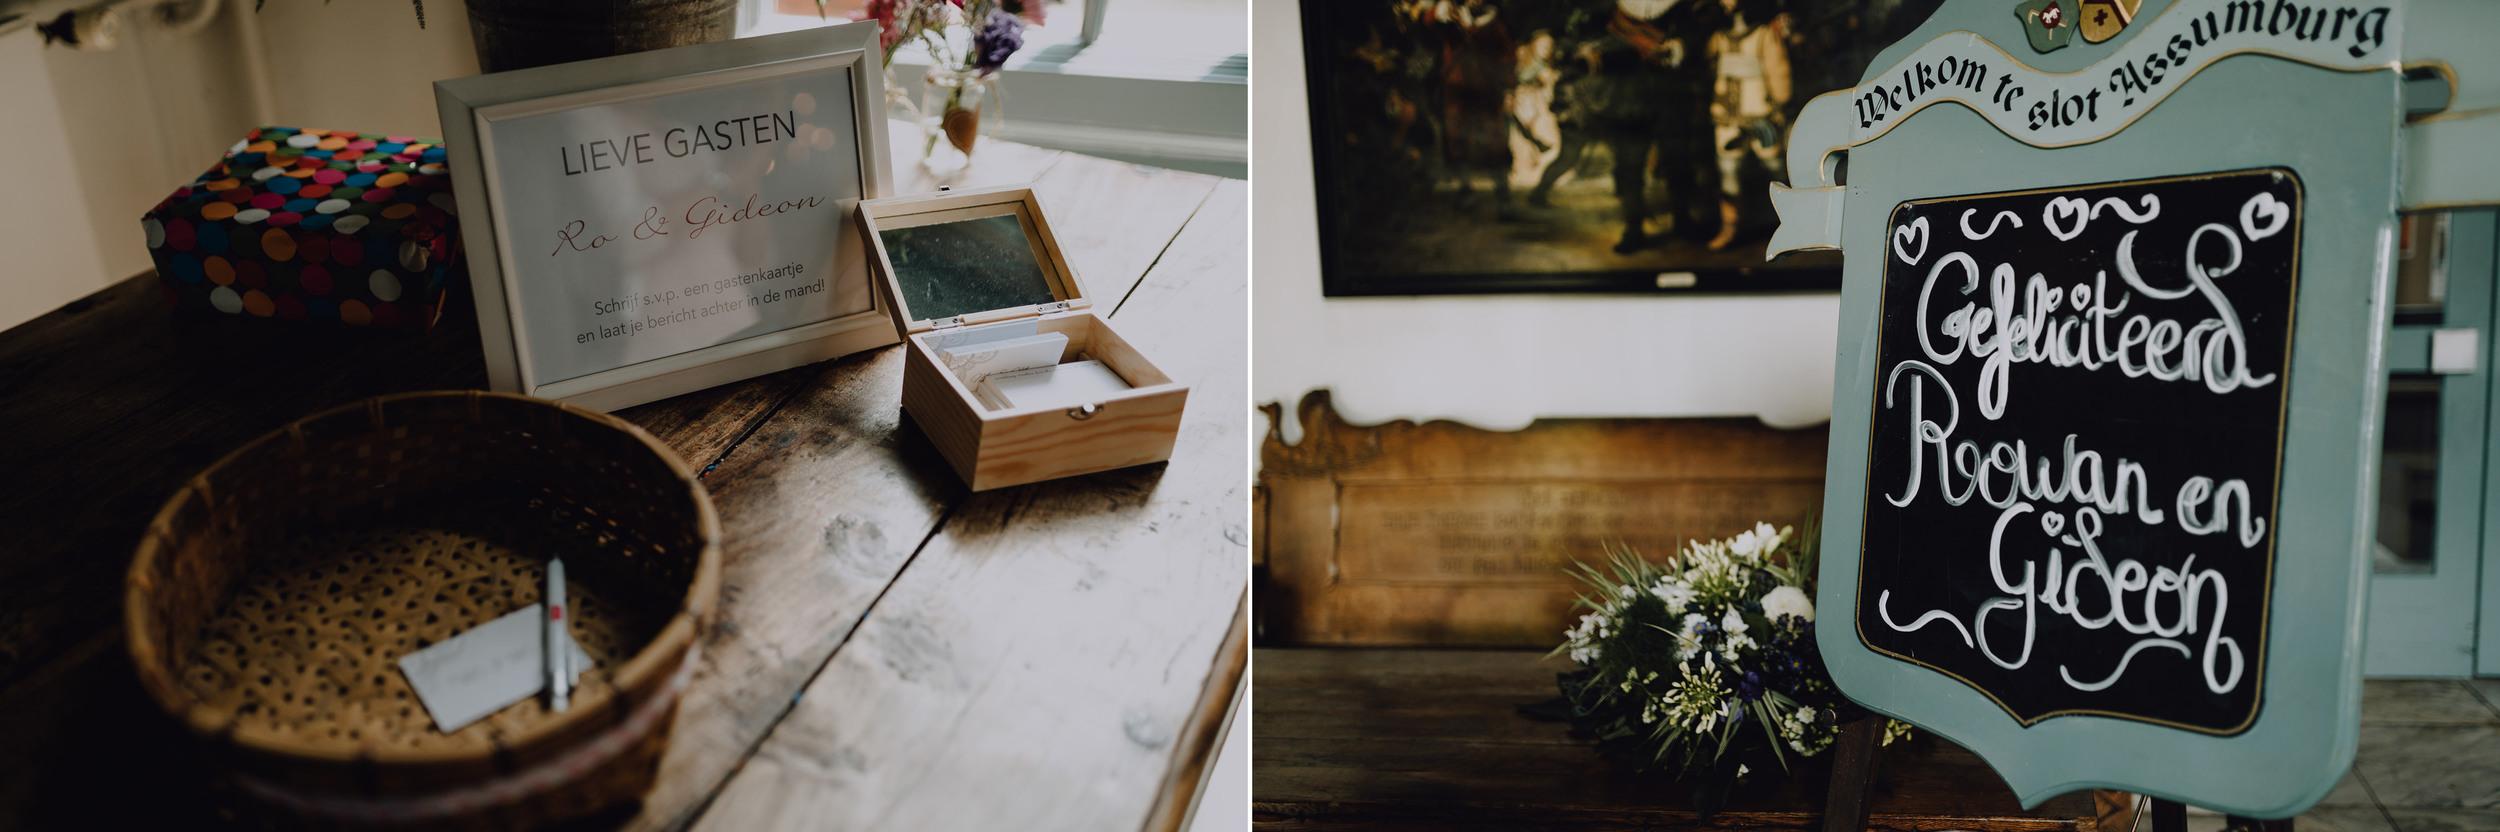 bruidsfotografie-amsterdam-utrecht-mark-hadden-wedding-photography-rowan-gideon-199 copy.jpg